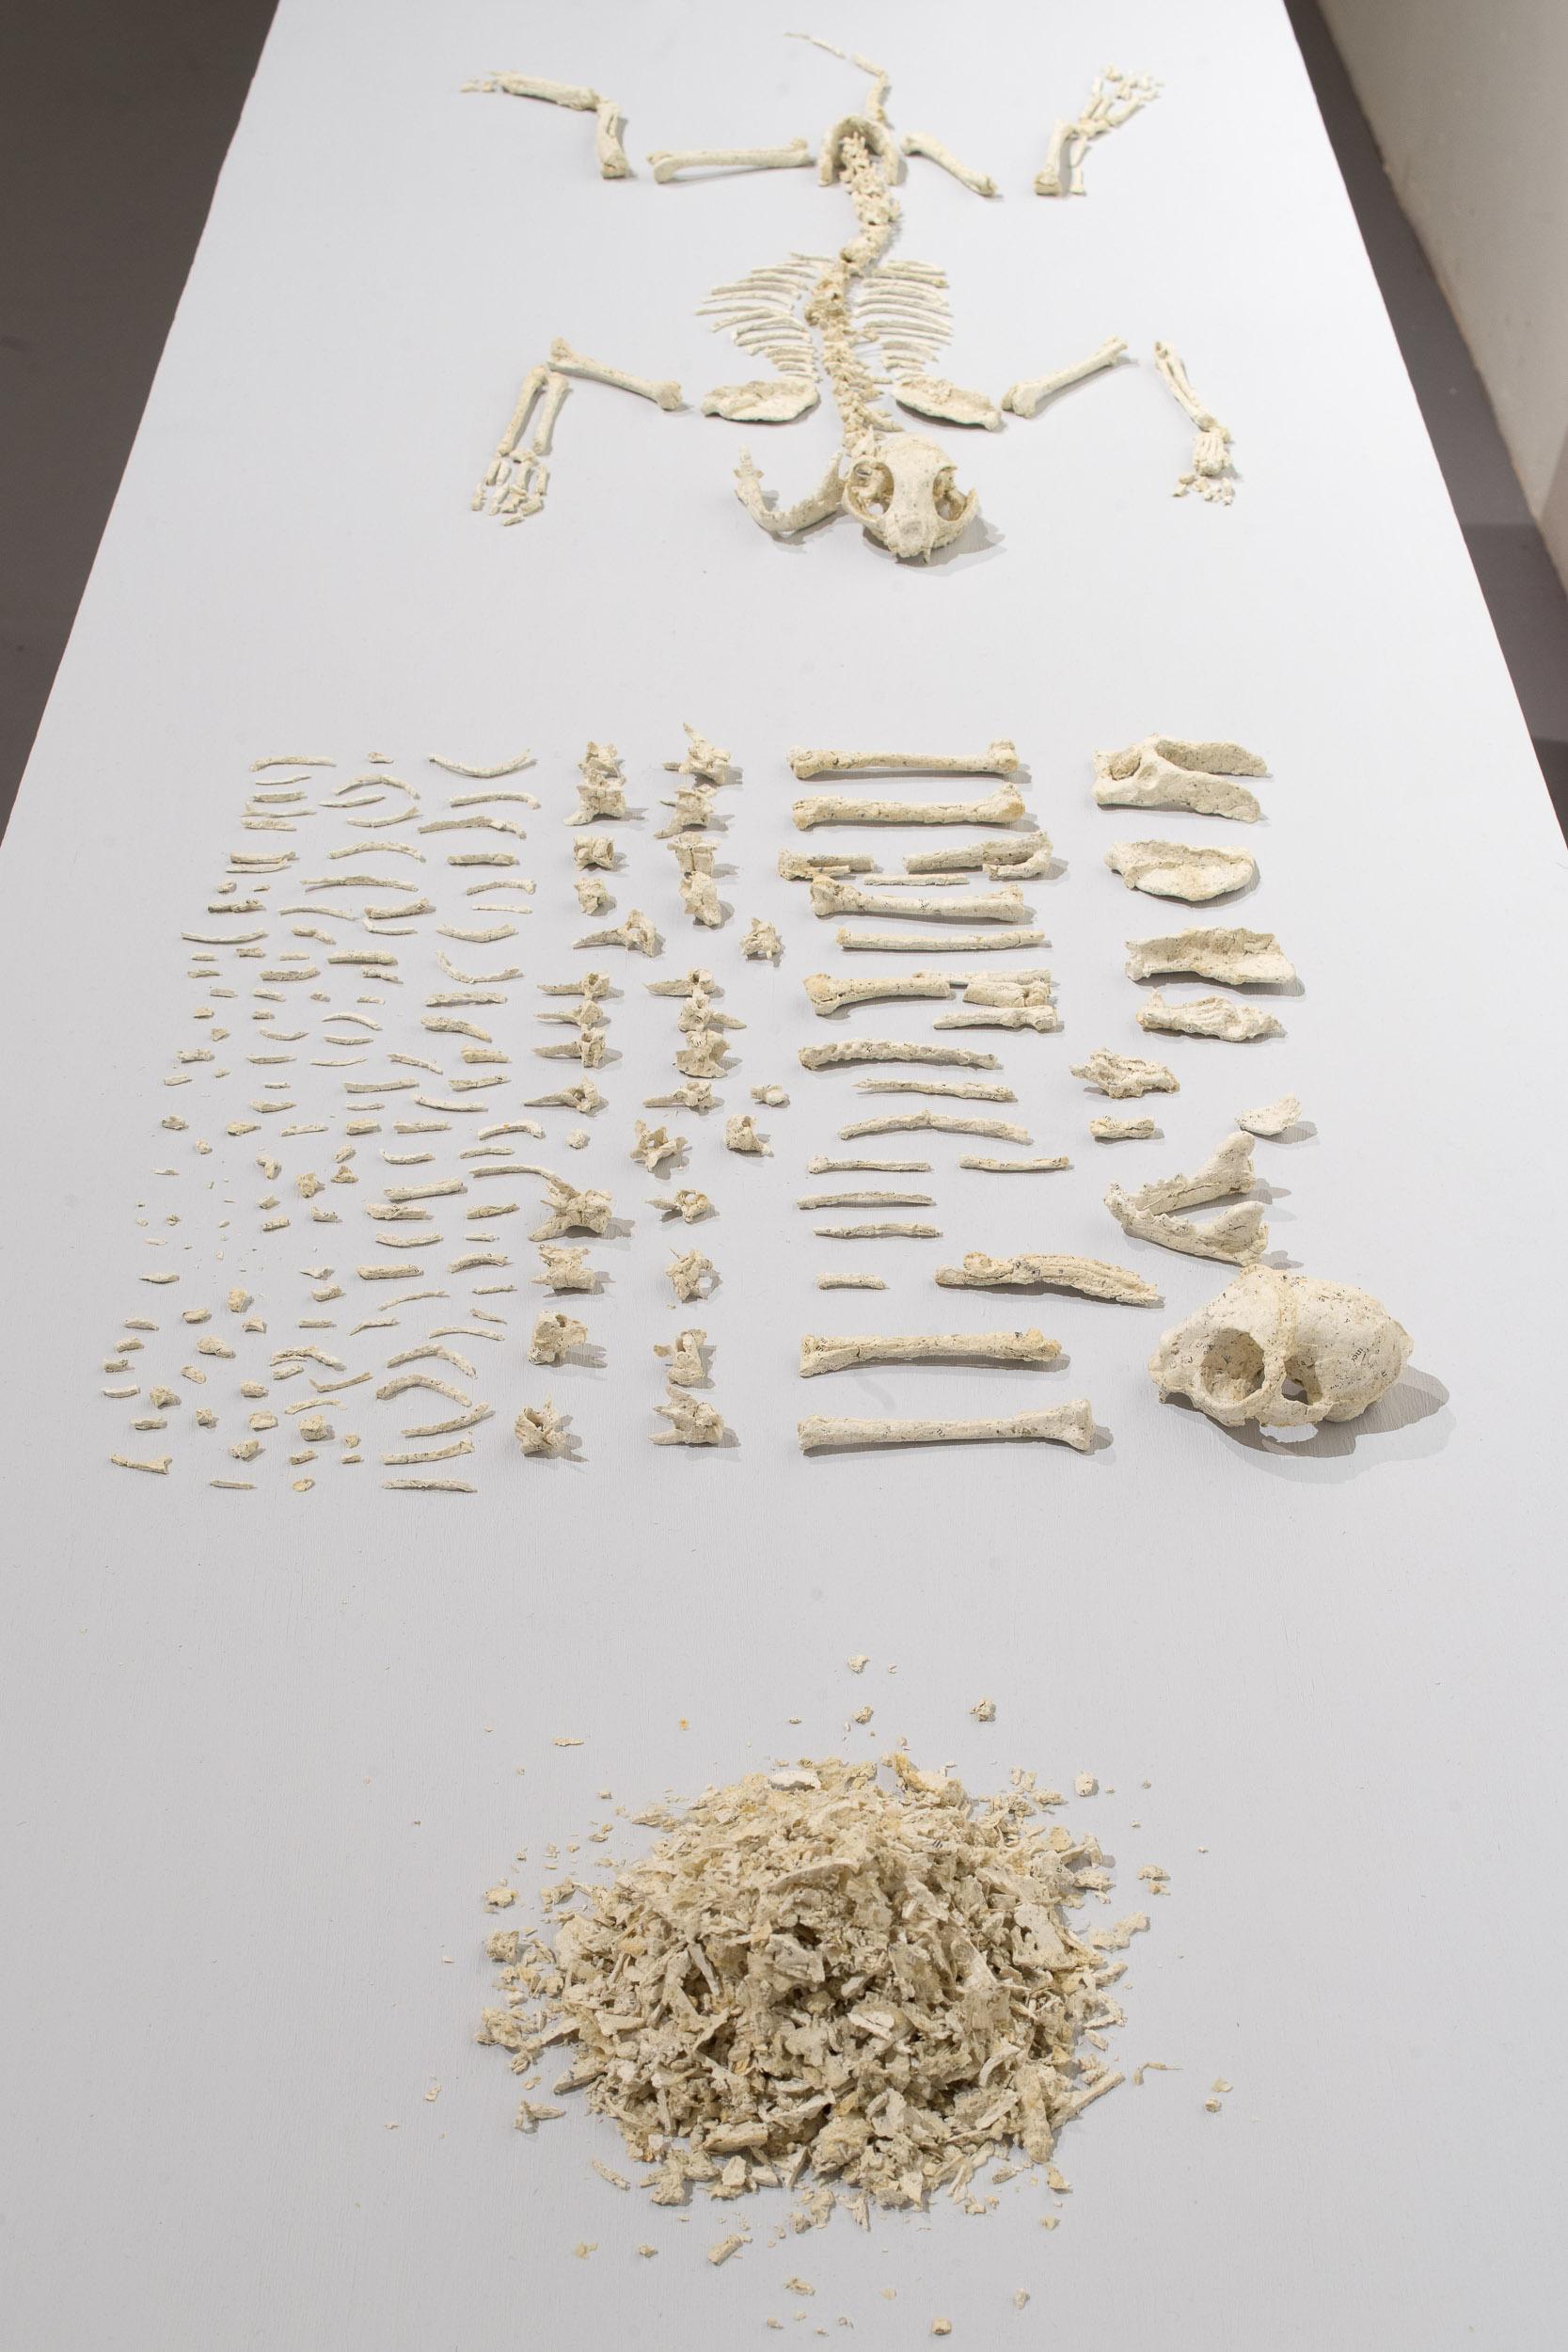 Rodrigo Arteaga, Practical Zoology: cat, mesa con esculturas de pepel tomado de un libro de zoología, 90 x 244 x 80 cm (mesa). Foto: Tomáš Souček